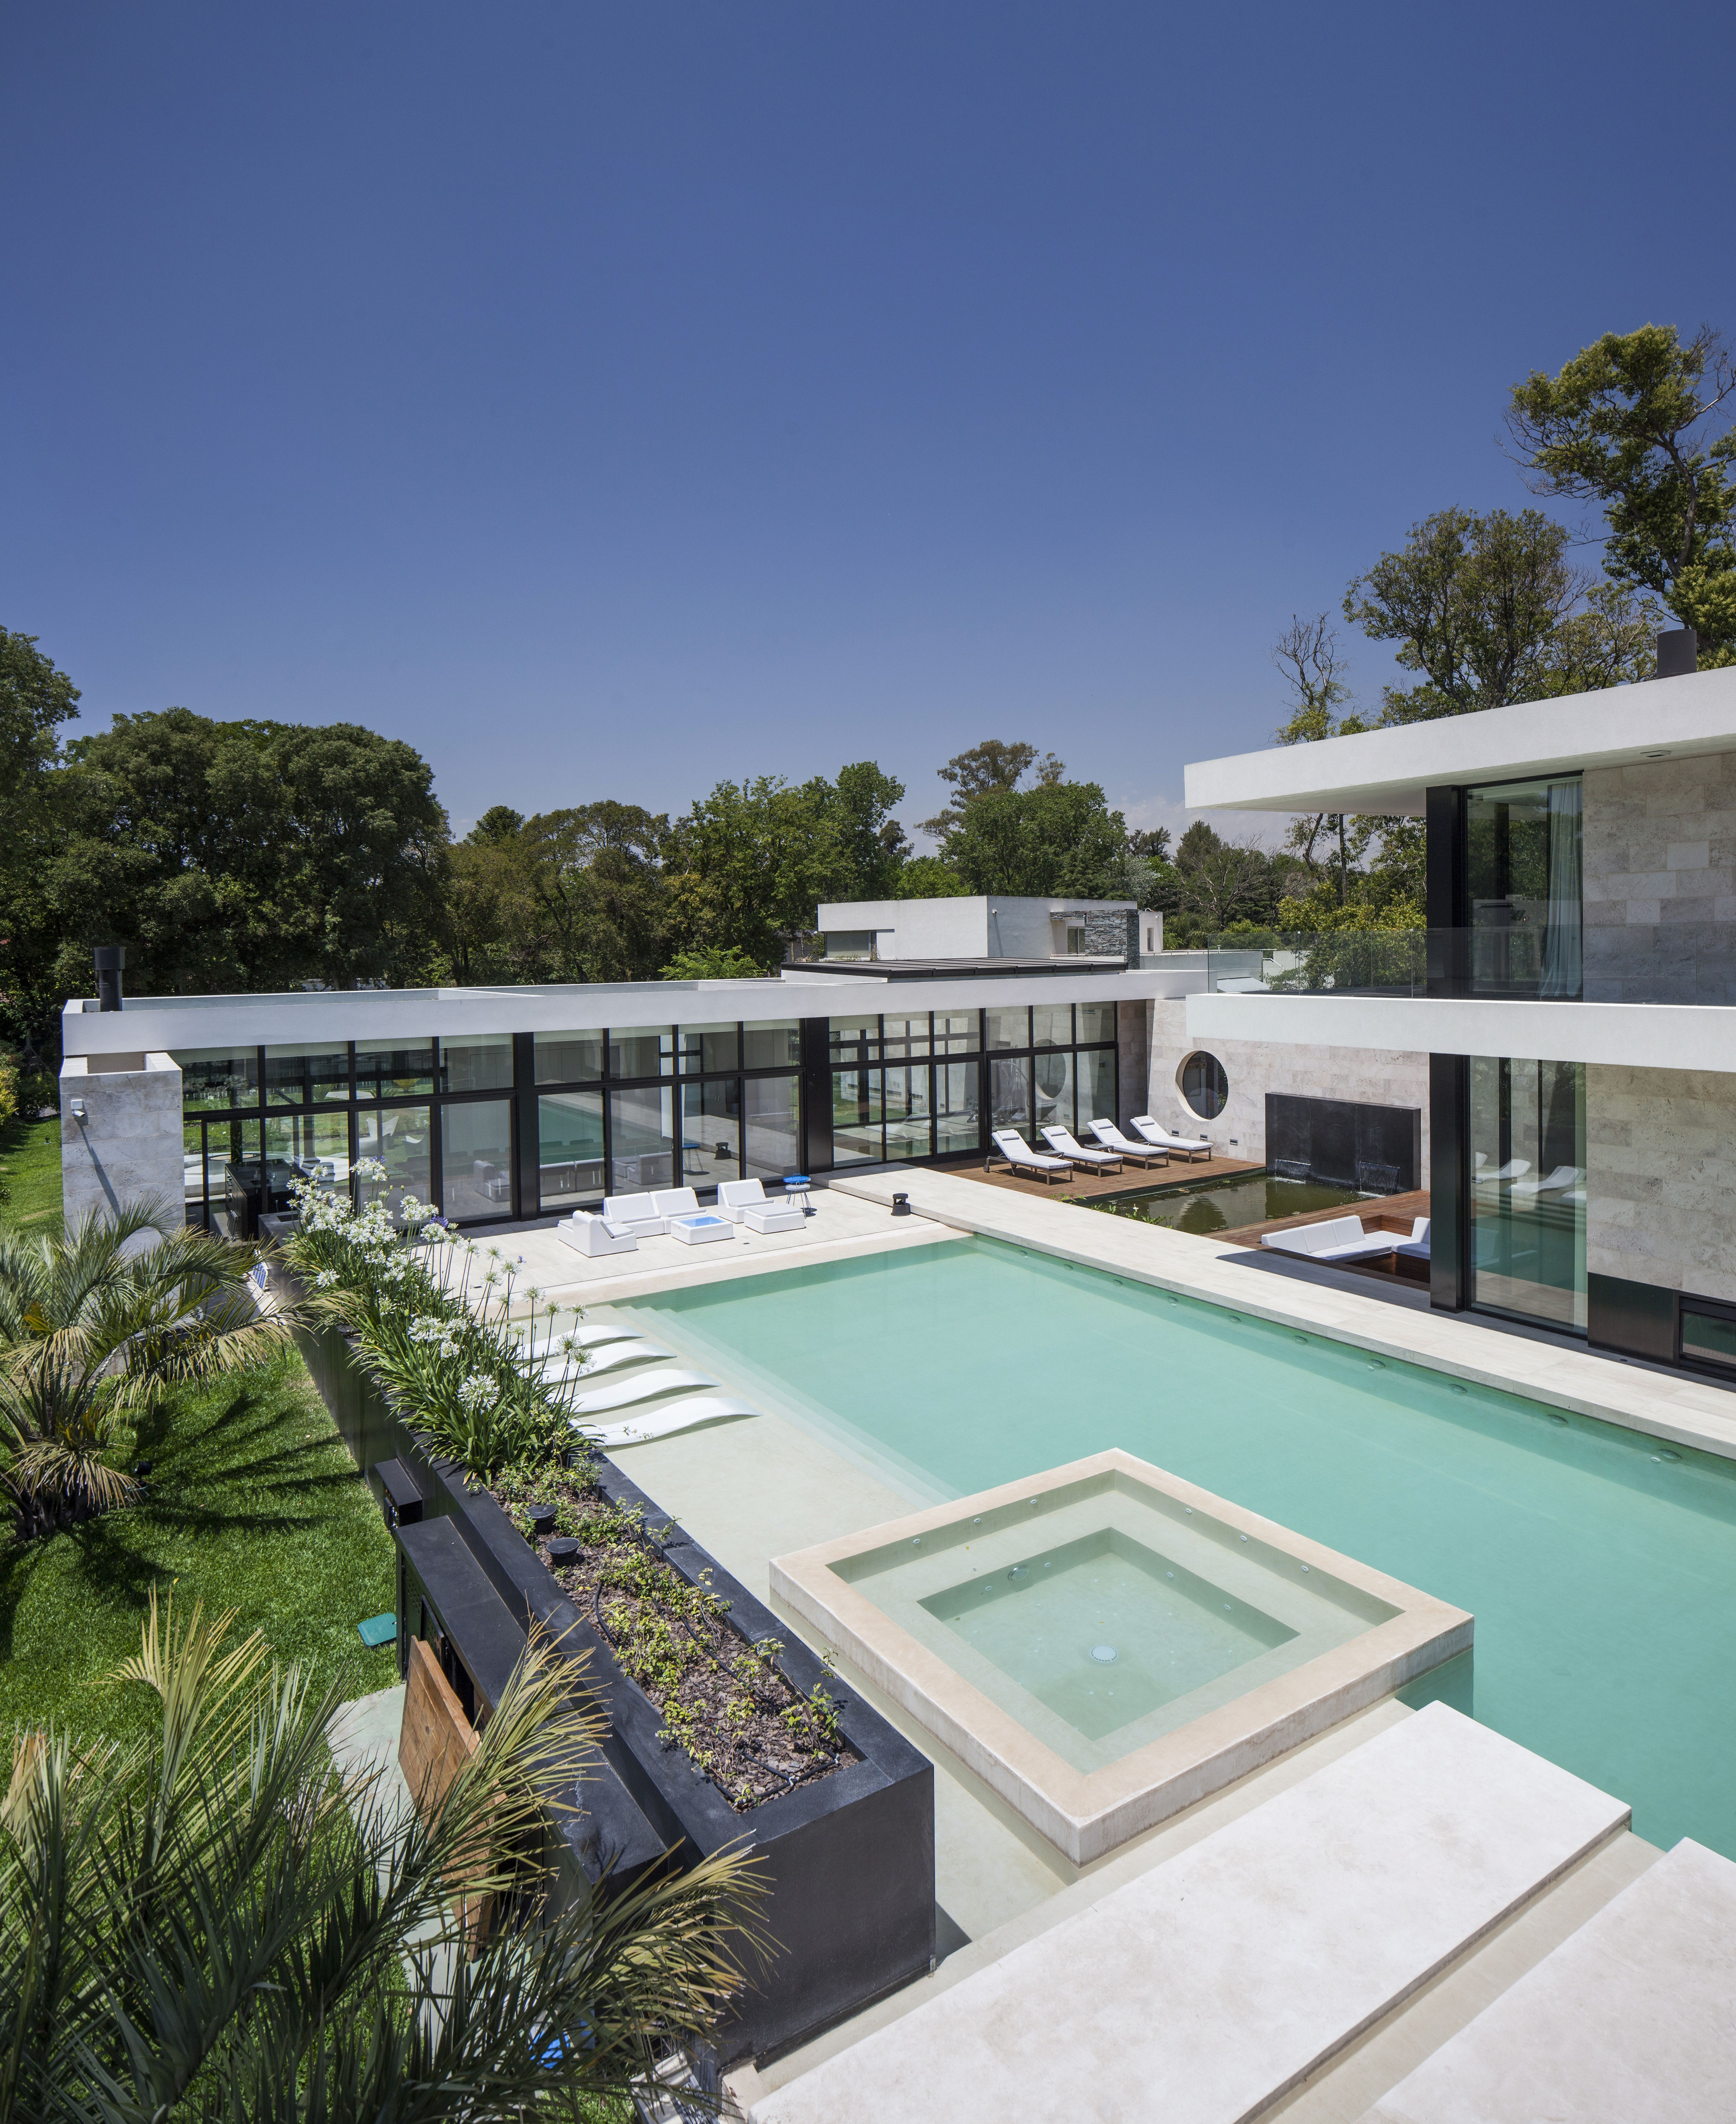 OON Architecture - Aqua House - 1400m2 - Big Swimming Pool ...